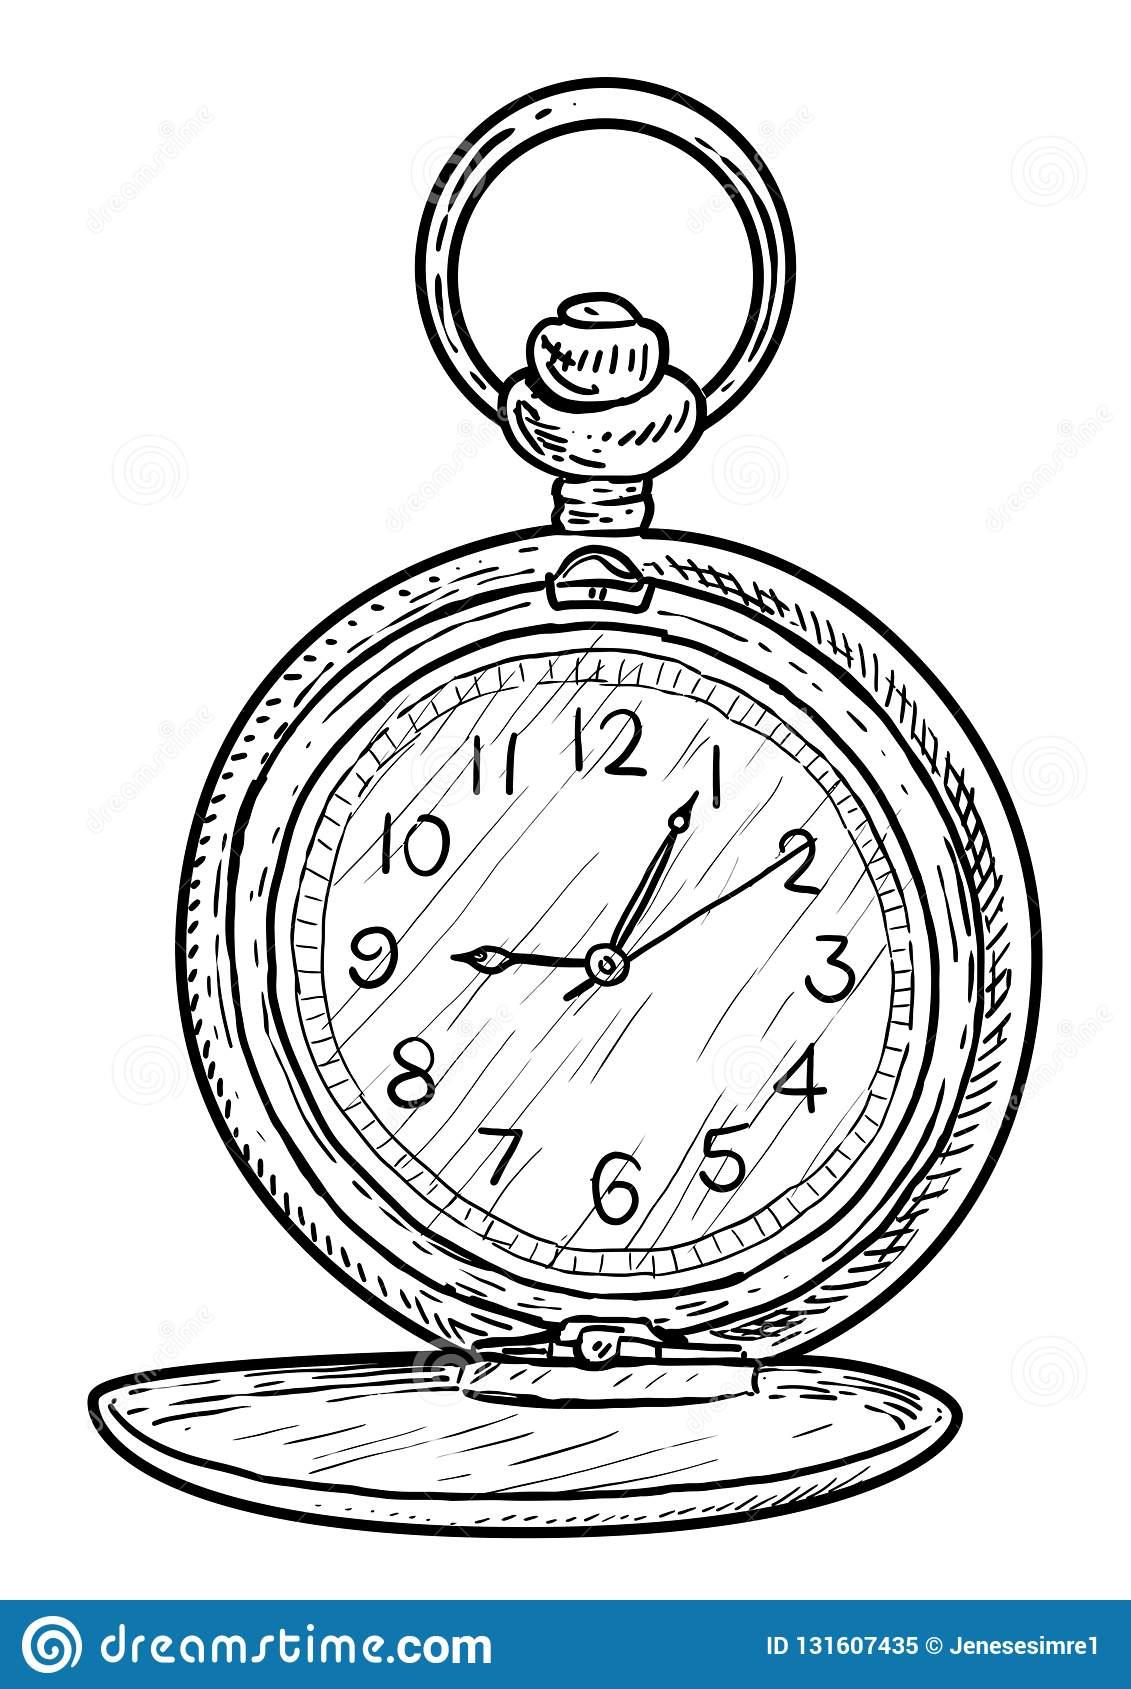 Illustration D'horloge De Poche, Dessin, Gravure, Encre à Dessin D Horloge